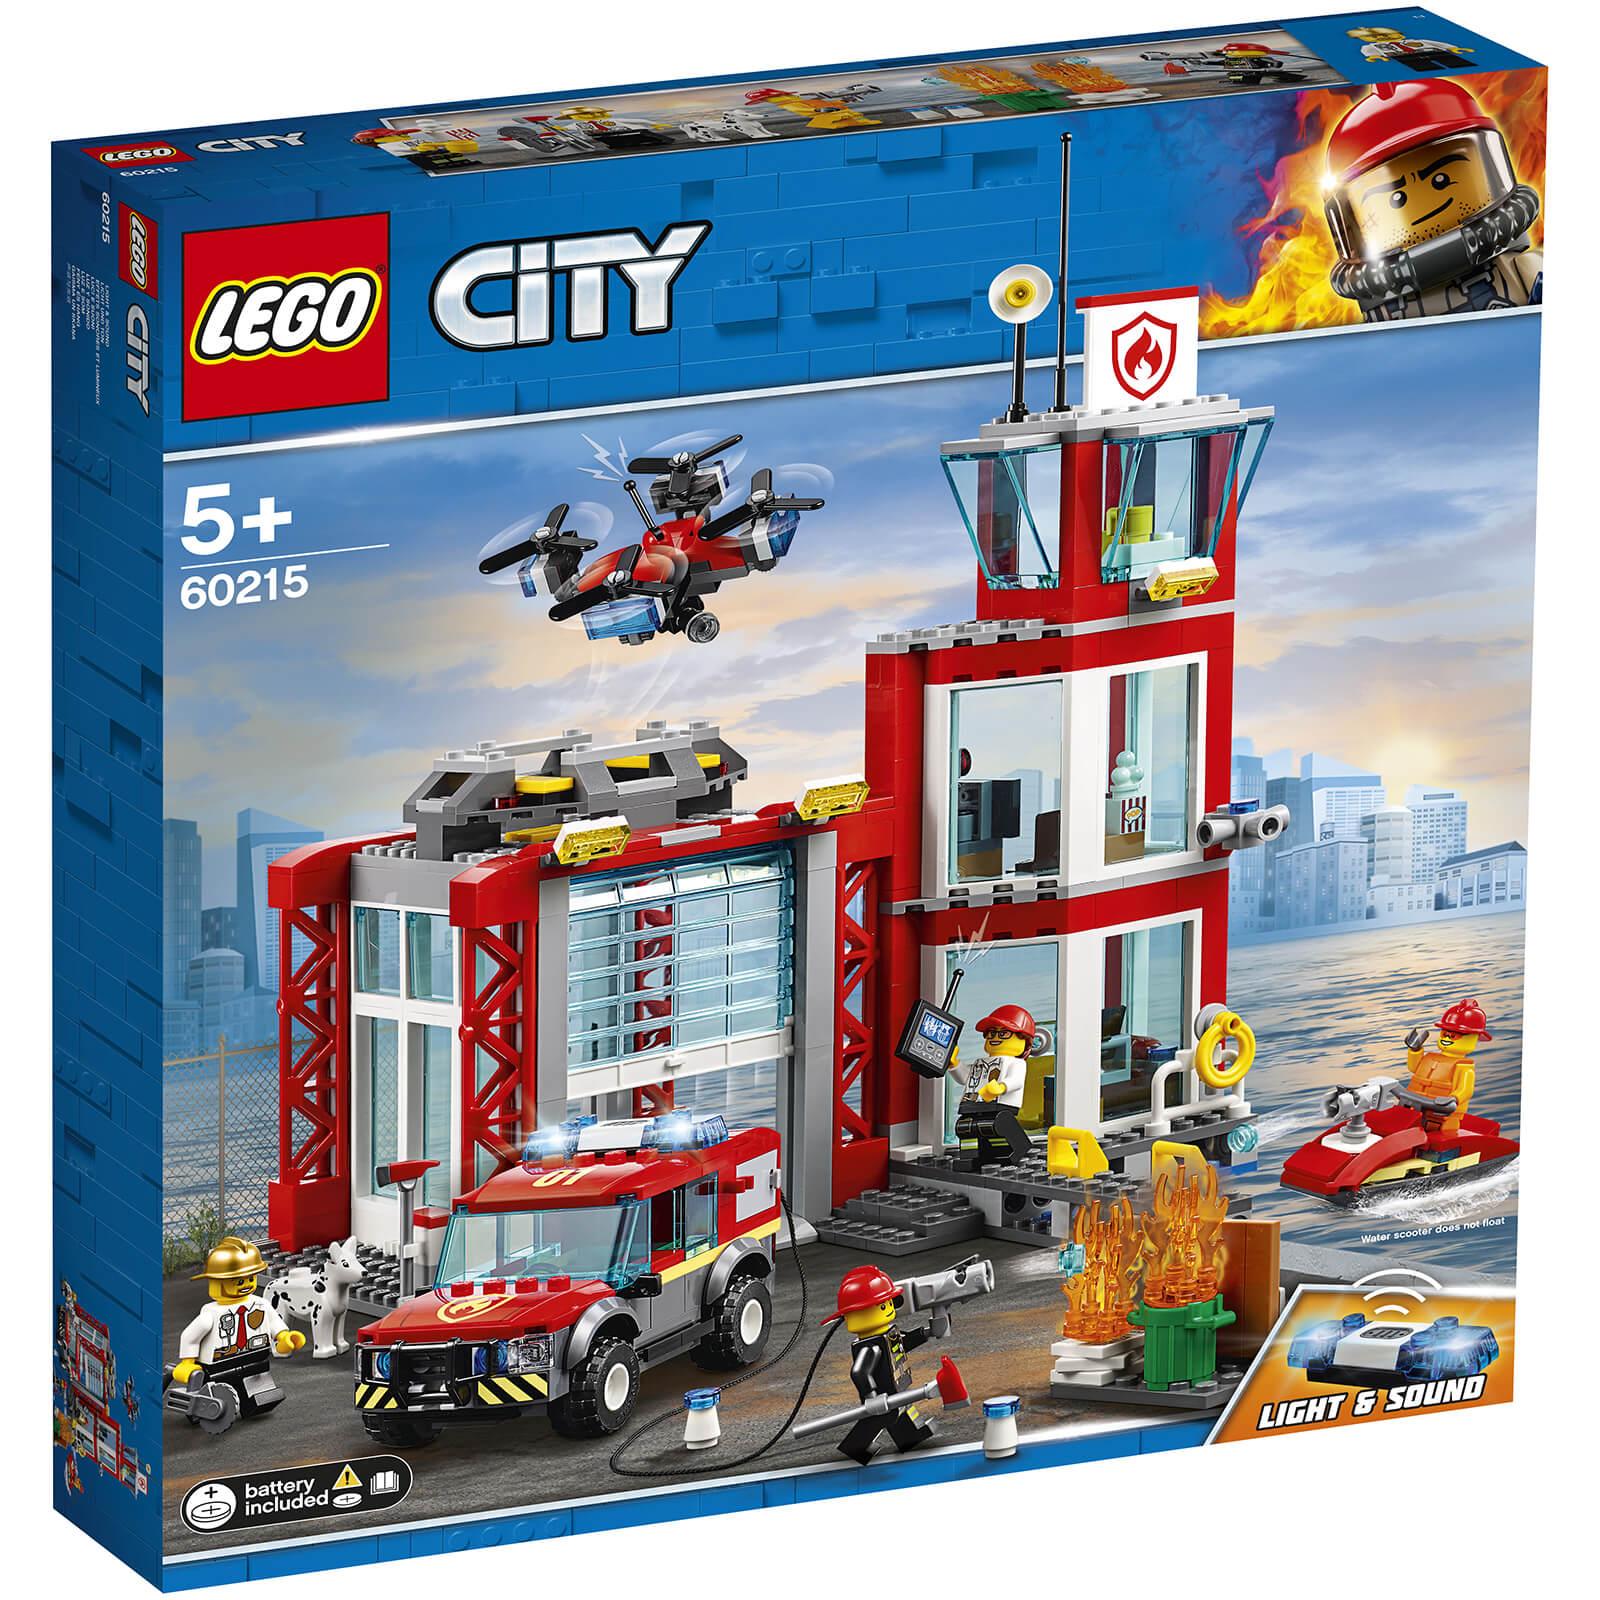 LEGO City: Fire Station Building Set (60215)